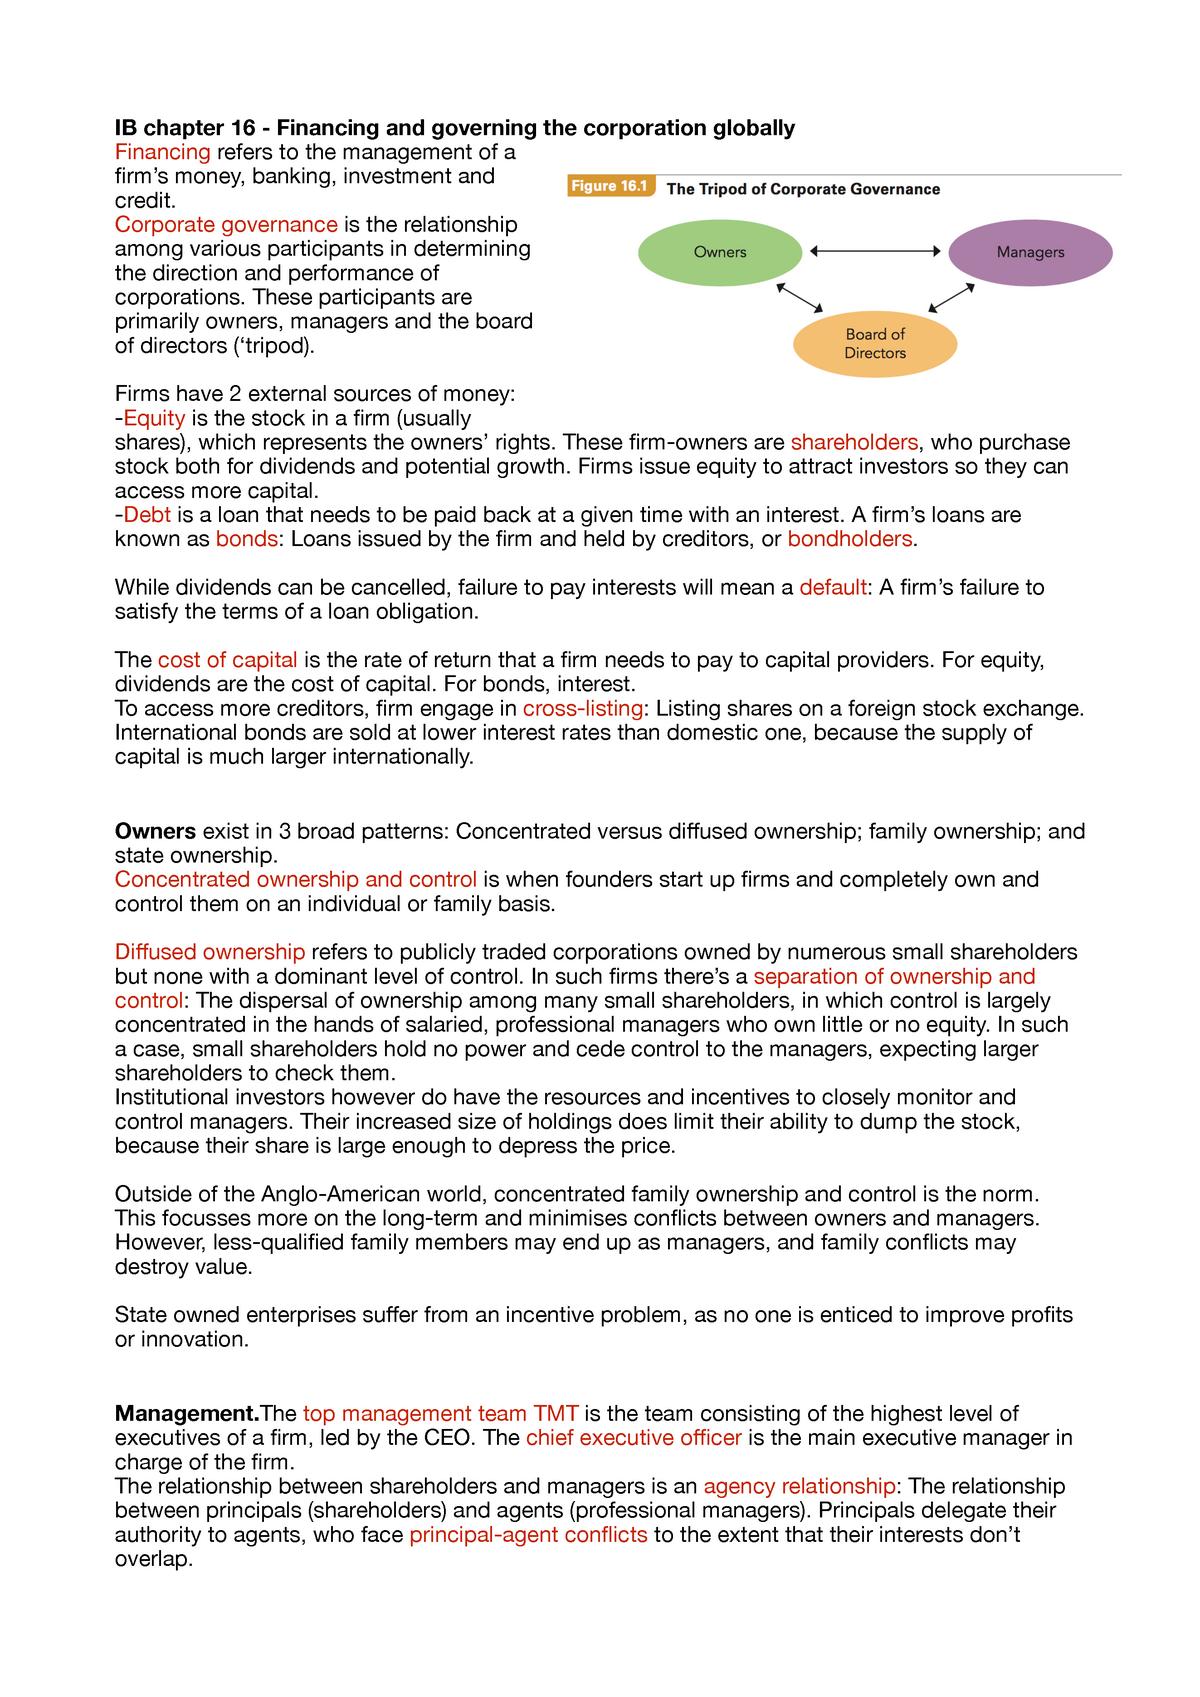 International business (Global business) summary